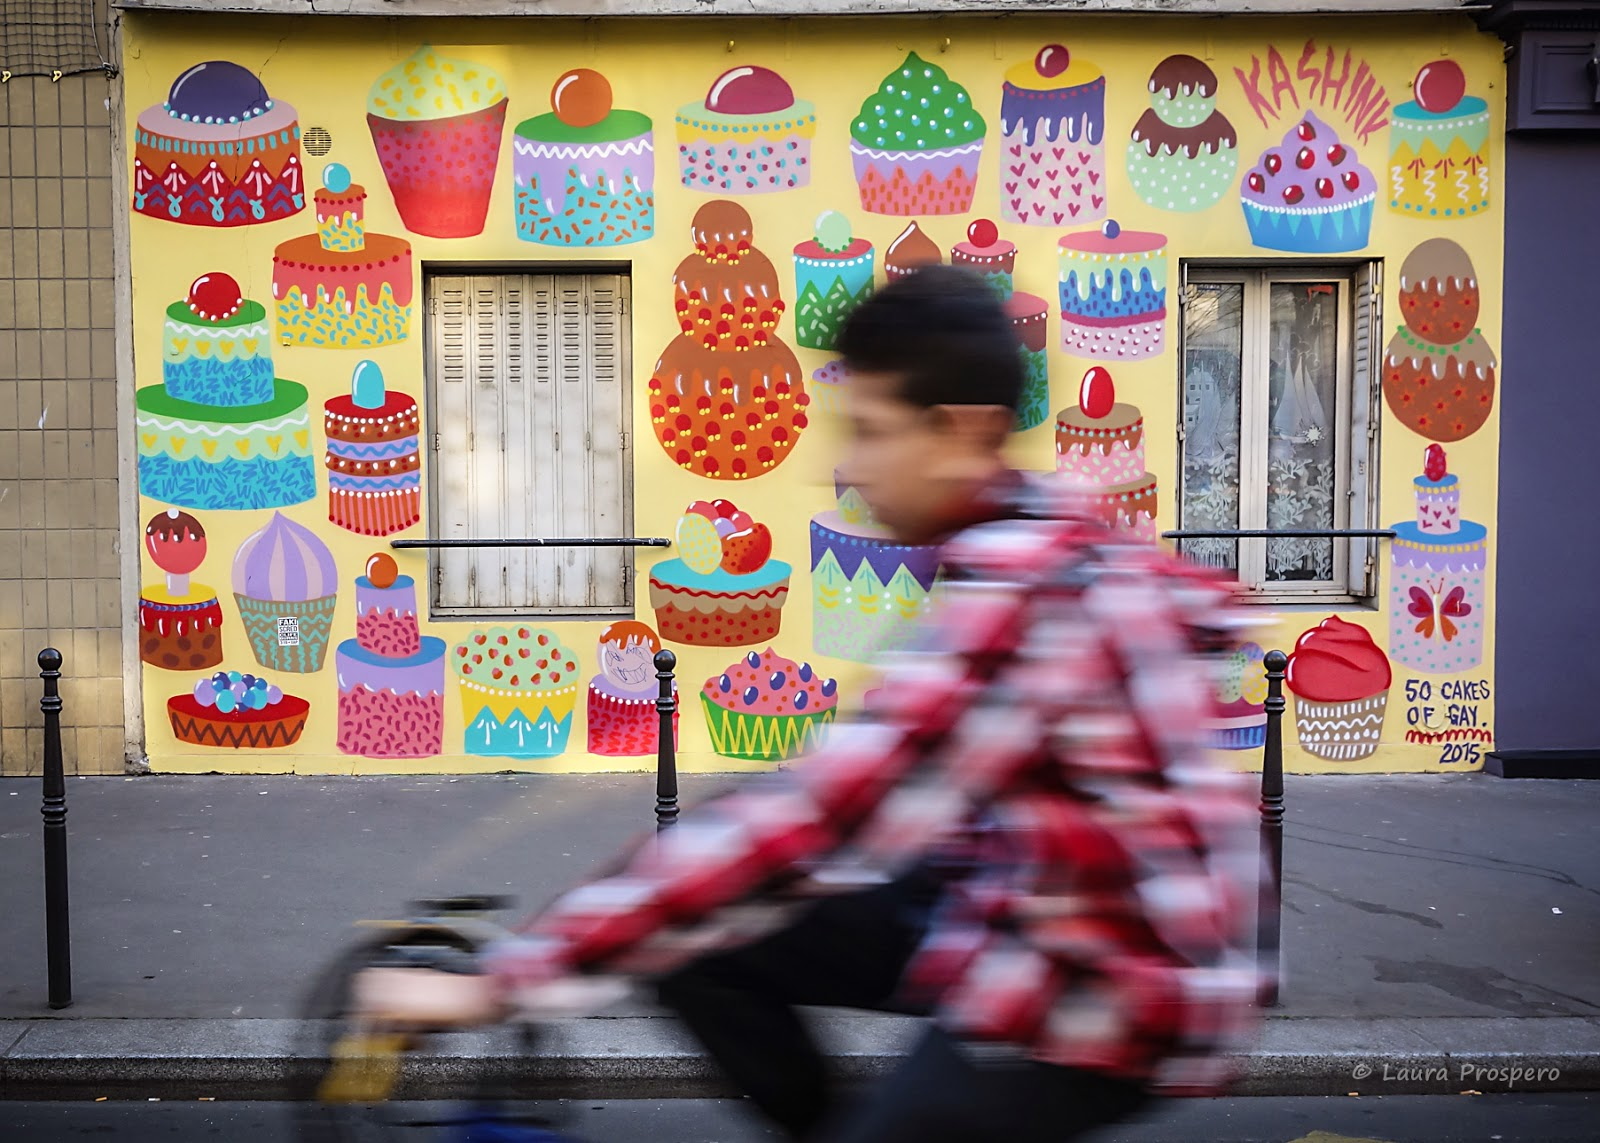 street art by kashink 2015 © Laura Prospero